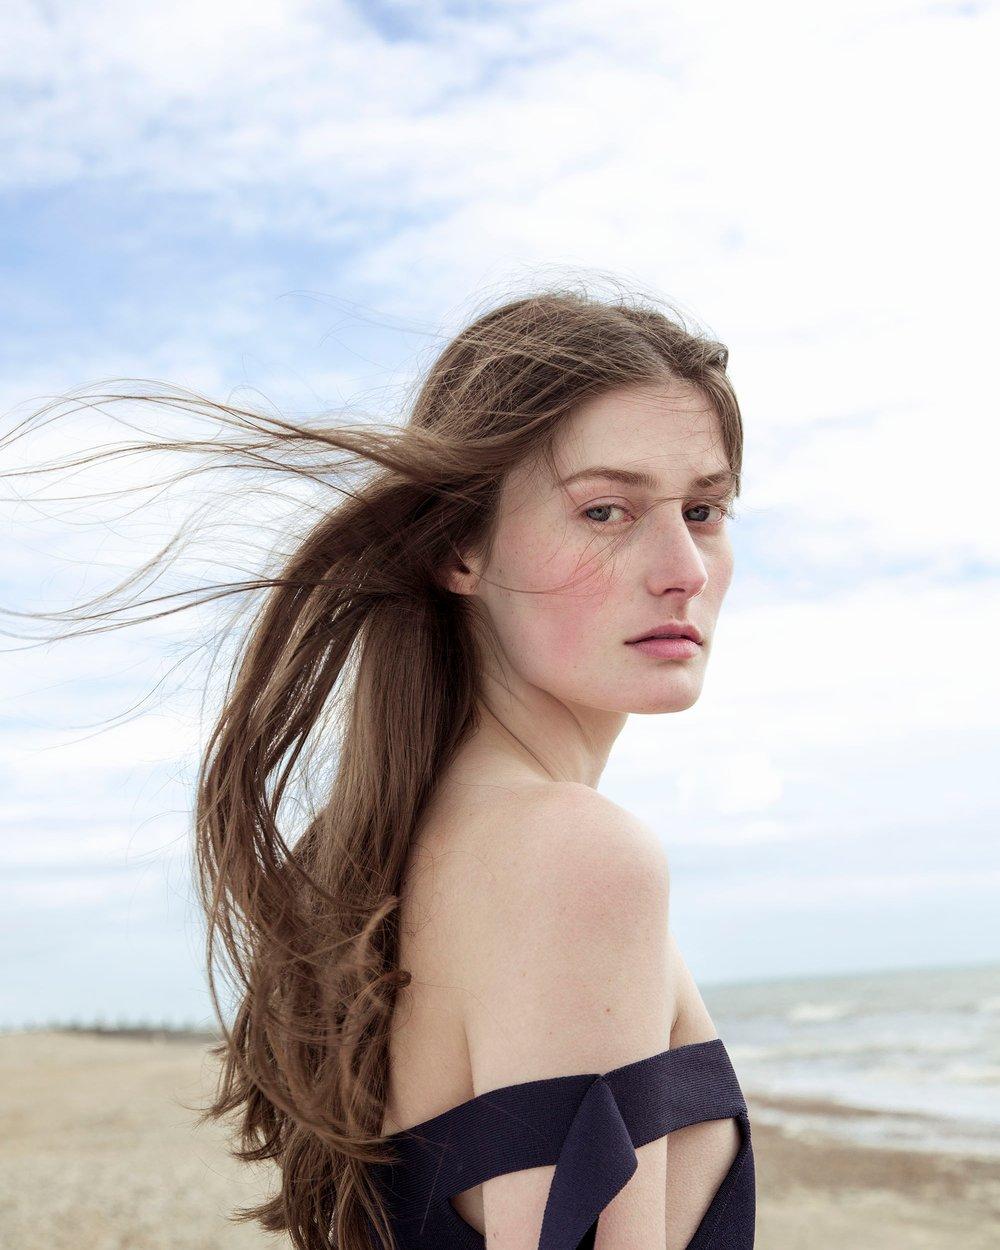 Fresh Air_Kristina Loewen_klein10.jpg